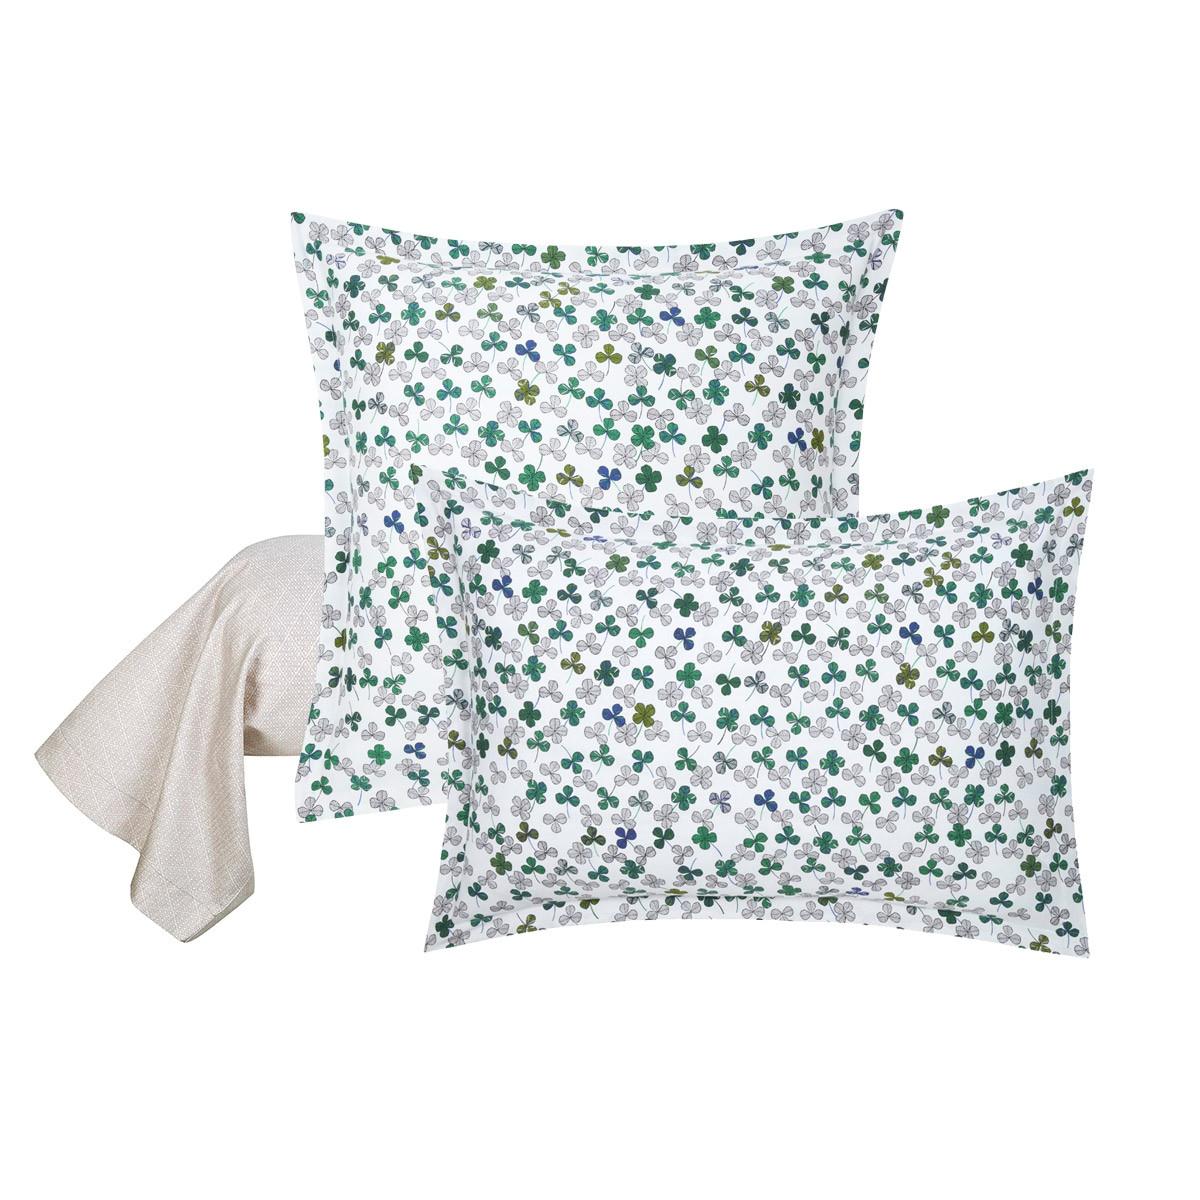 purchase atout pillowcase online